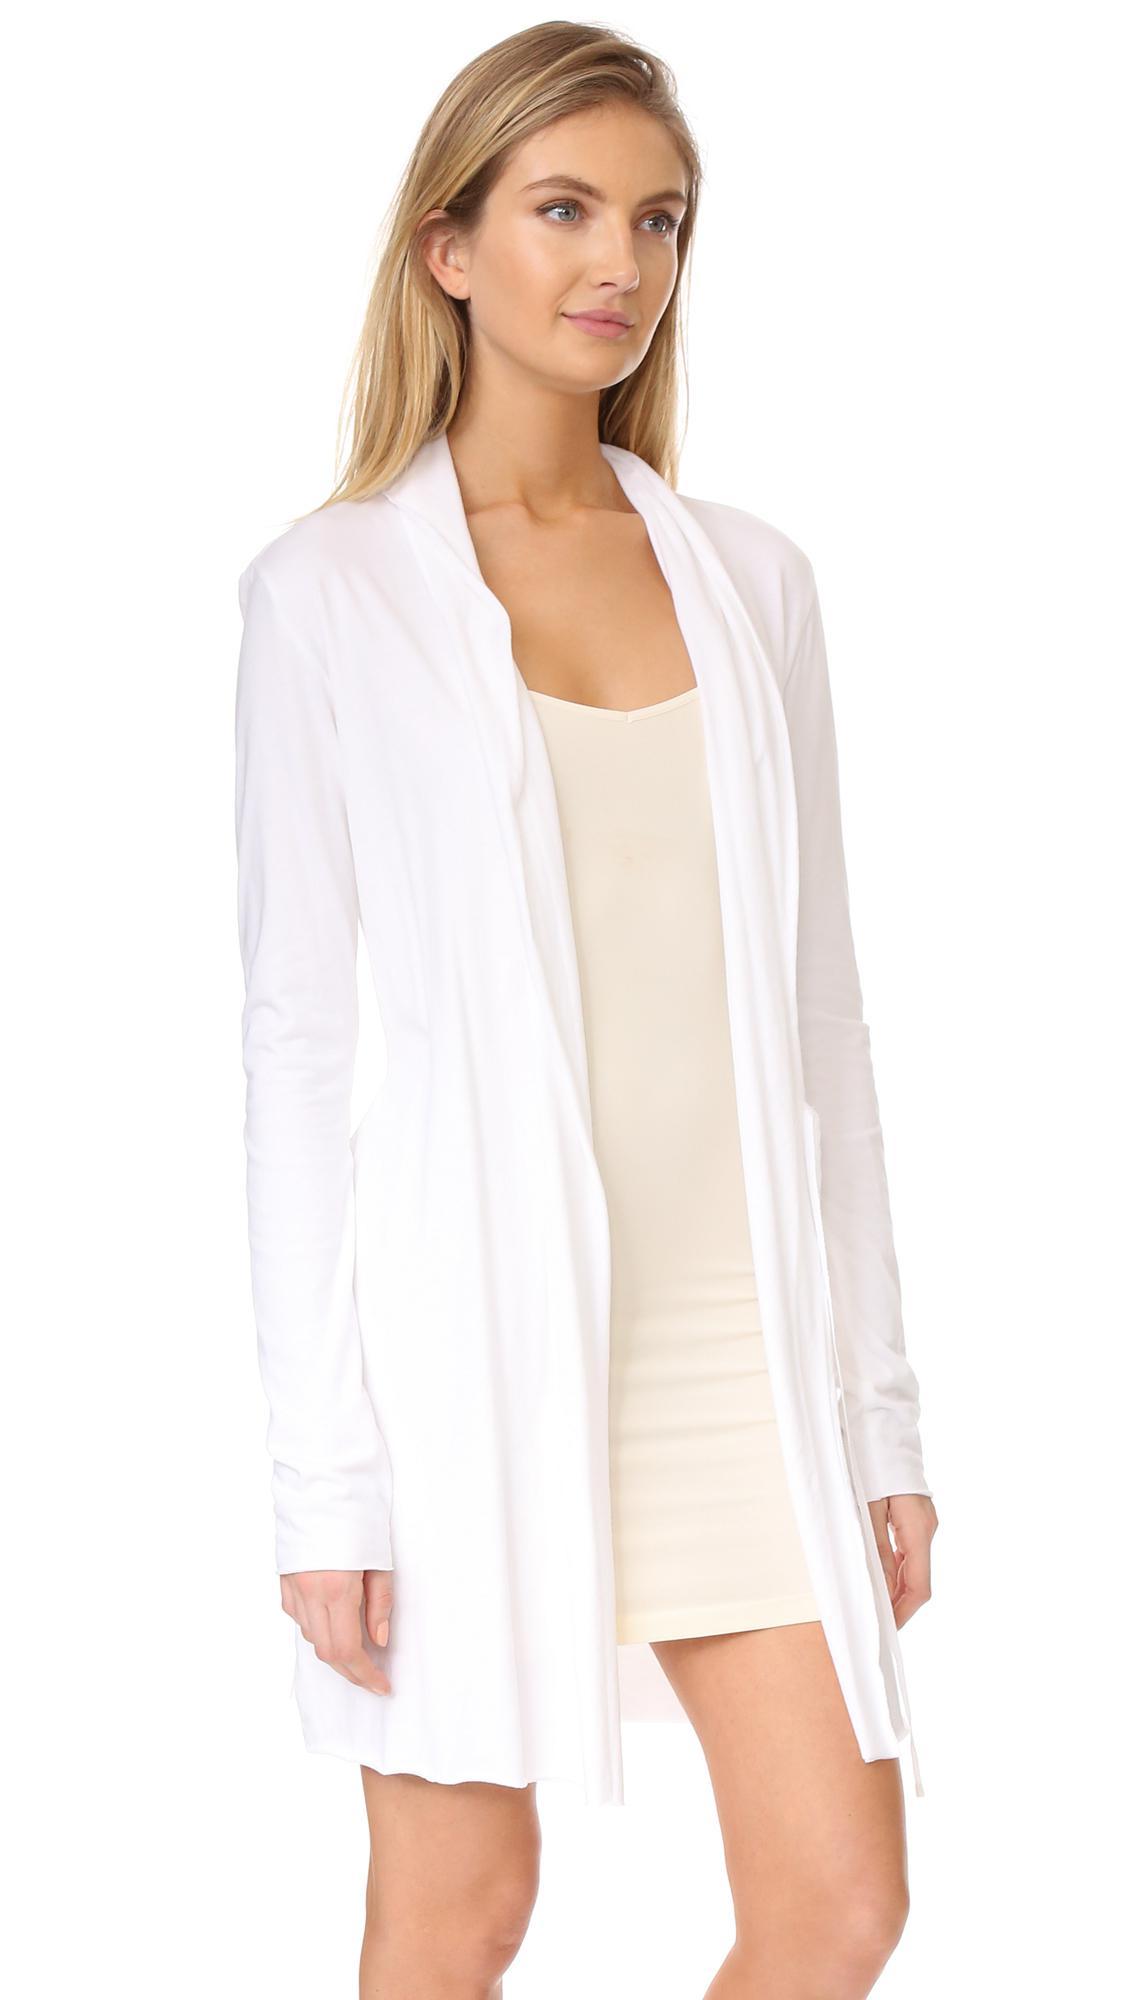 a6aebaf043b Skin Wrap Robes in White - Save 2.232142857142861% - Lyst